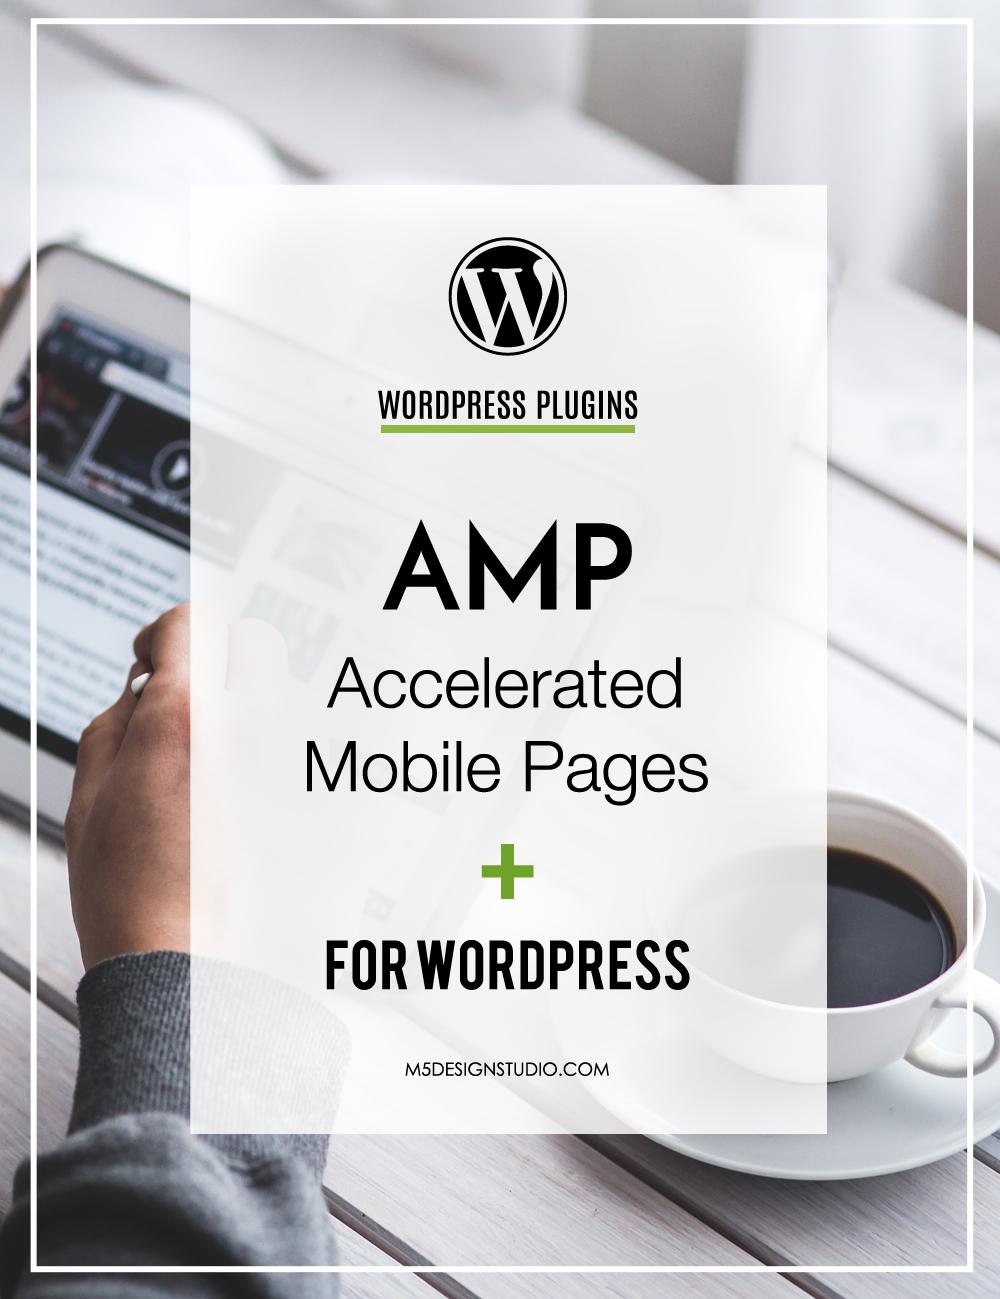 wordpress AMP orlando